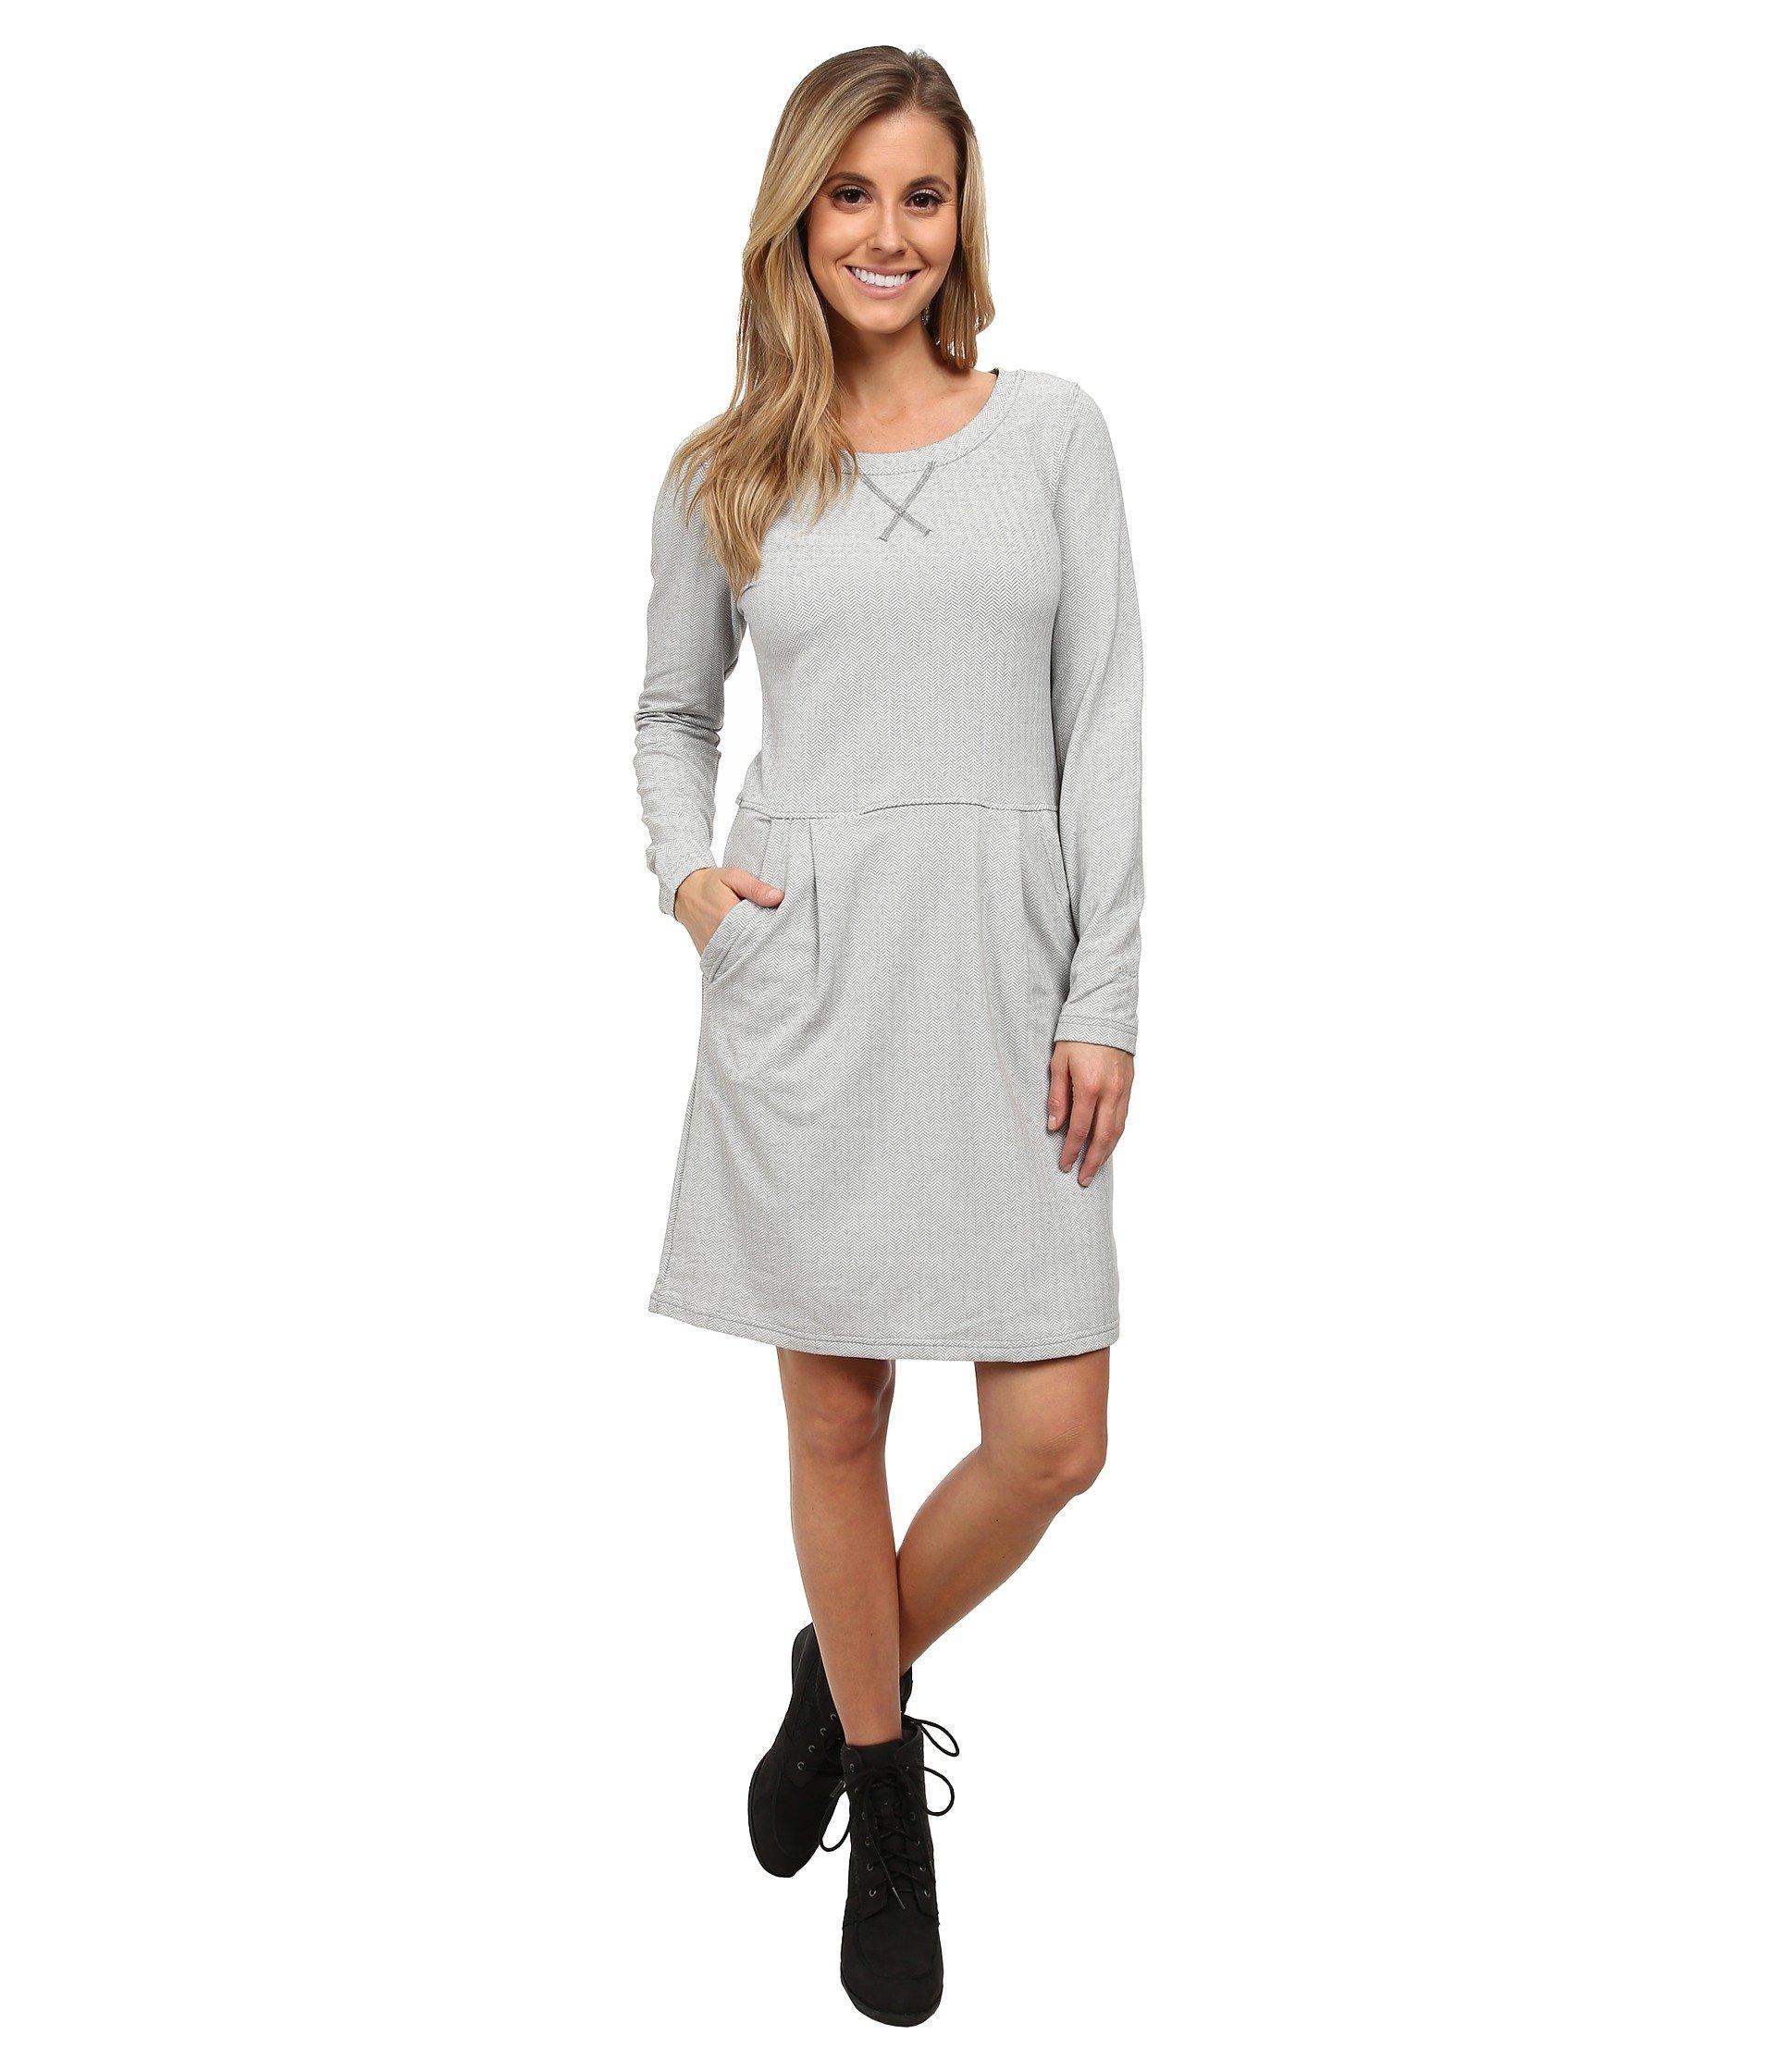 a4c776b1cc7 Patagonia Active Herringbone Dress in Gray - Lyst